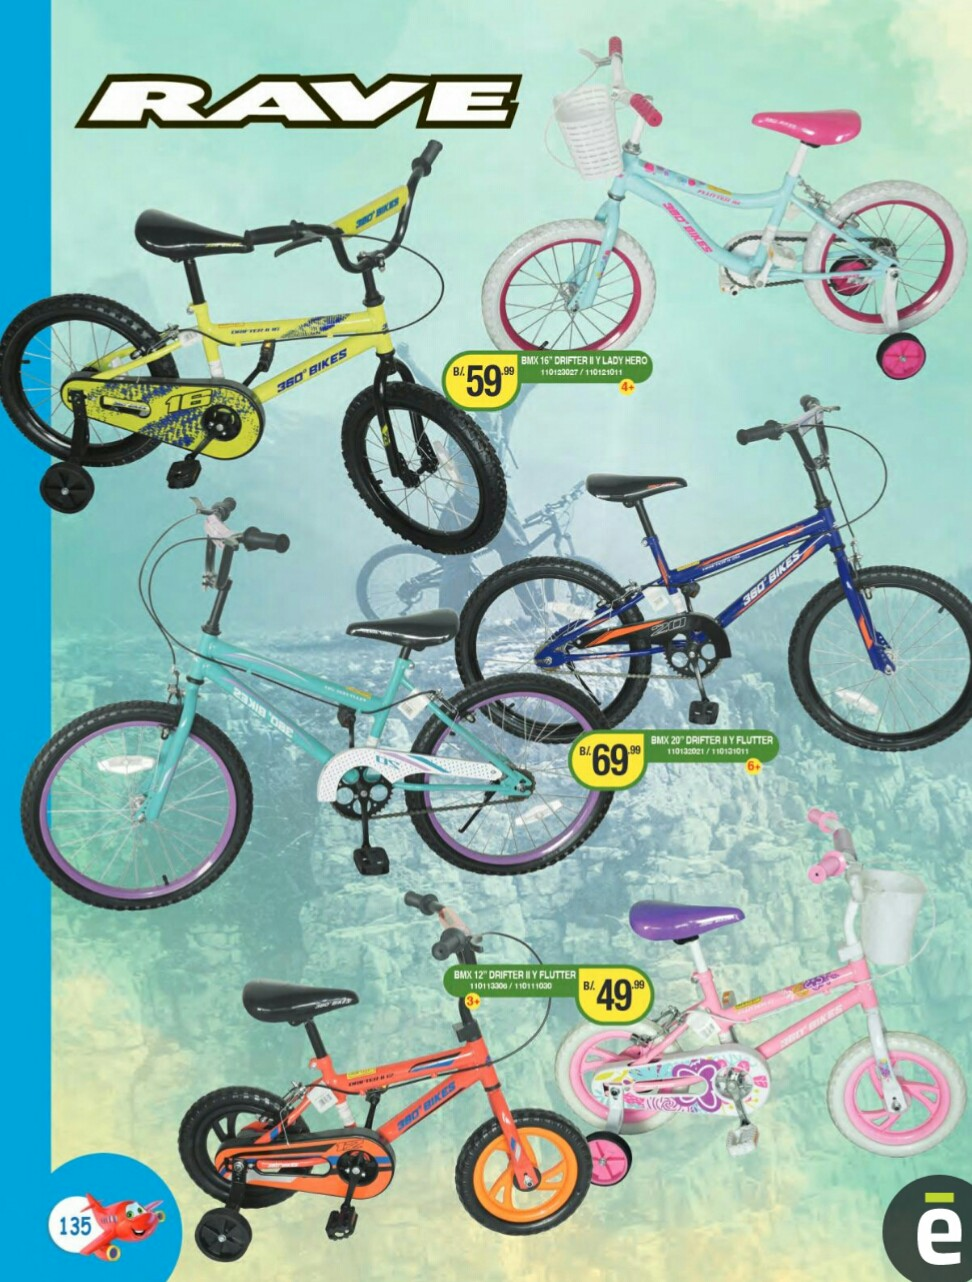 Catalogo juguetes Titan Toys 2019 p135